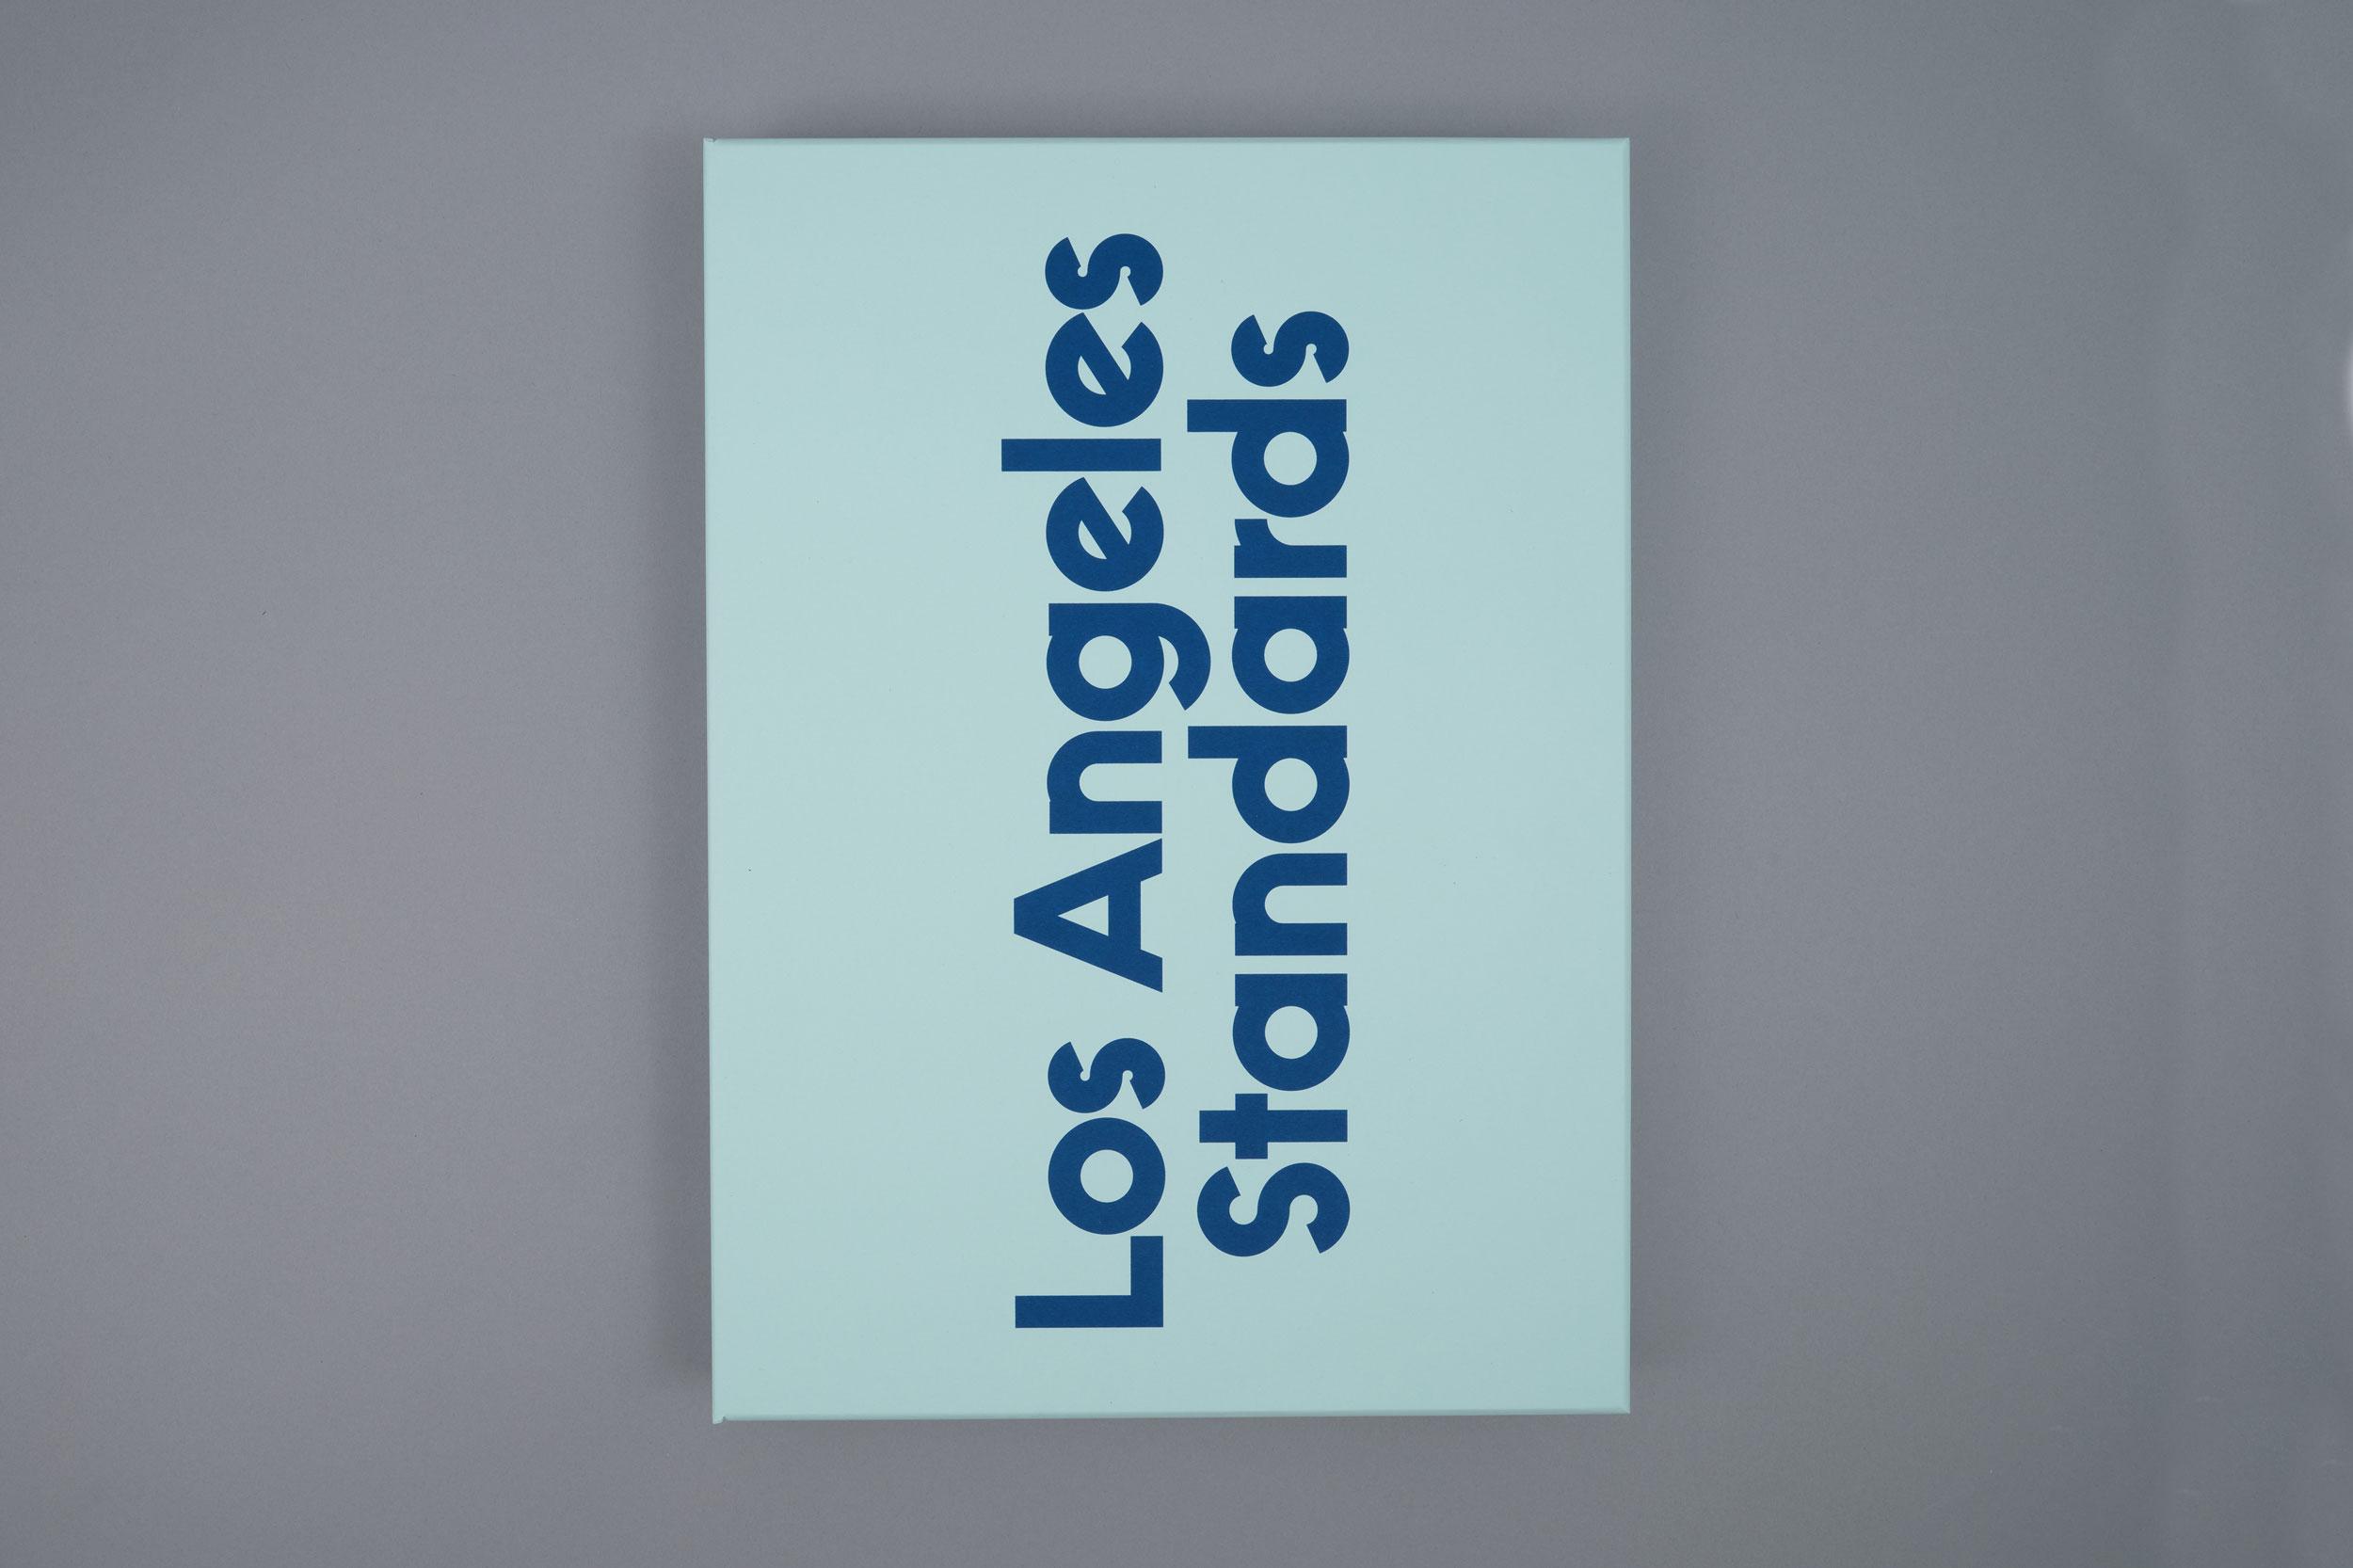 Los-angeles-standards-portfolio-delpire-10w